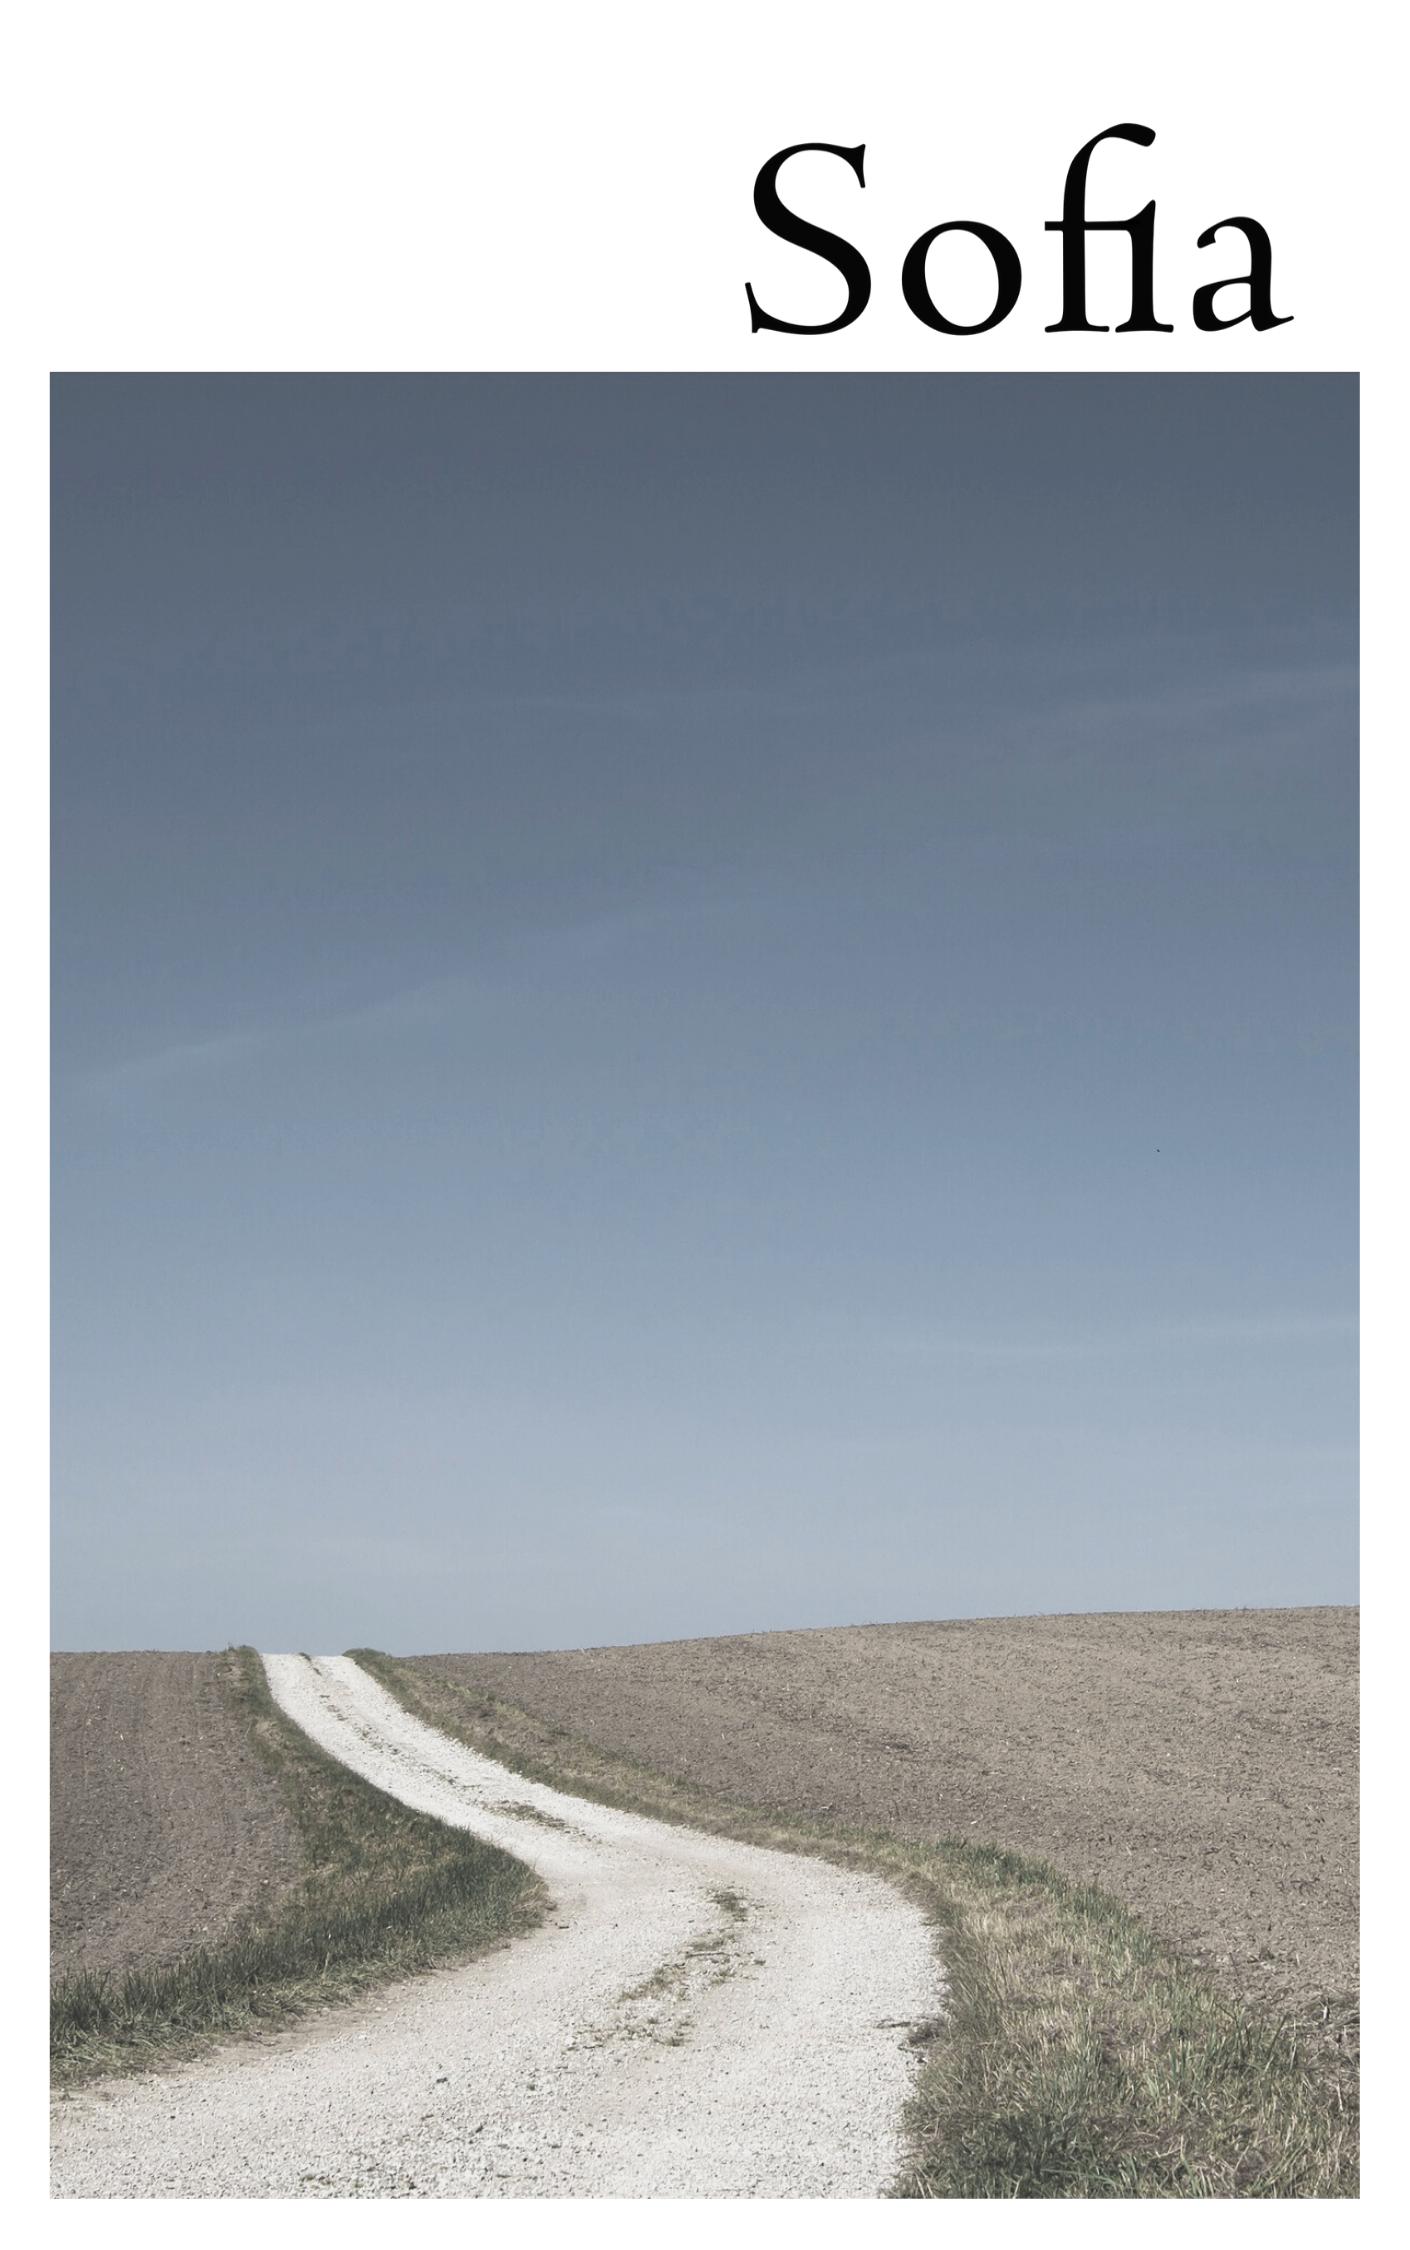 Visualizar v. 9 n. 1 (2020): Dossiê Filosofia Clássica Alemã